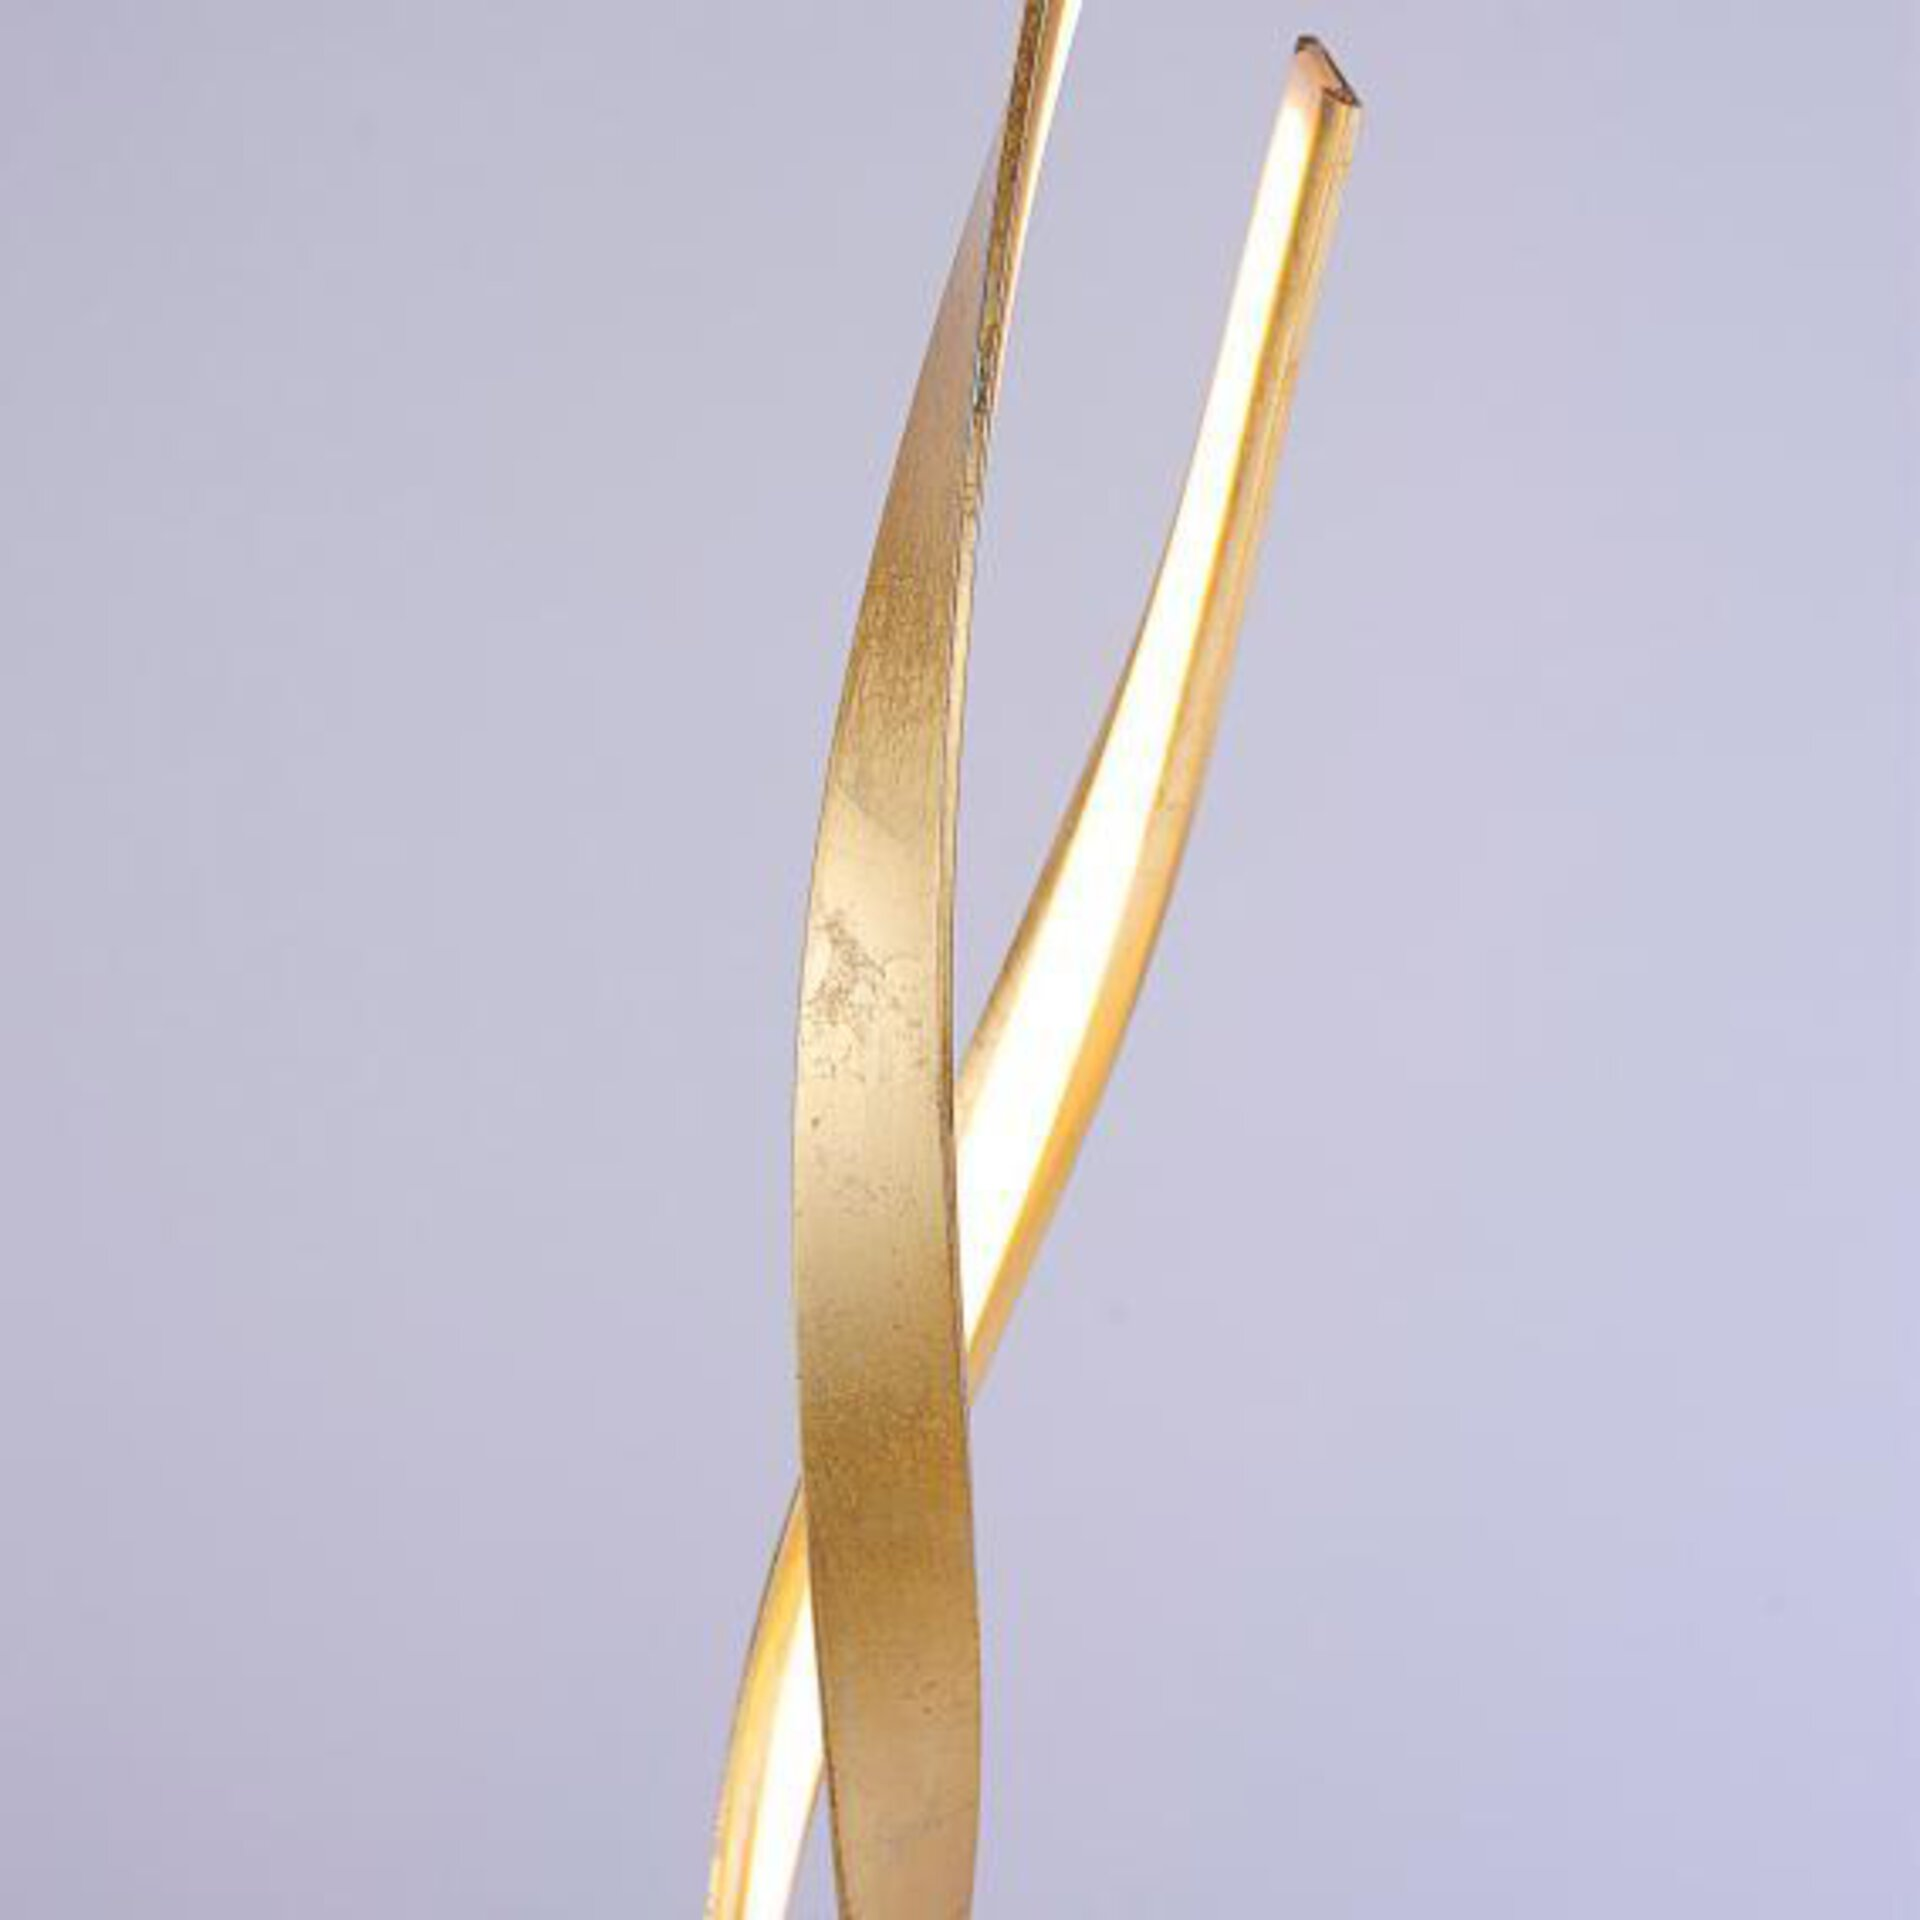 Stehleuchte LINDA Paul Neuhaus Metall 23 x 140 x 23 cm